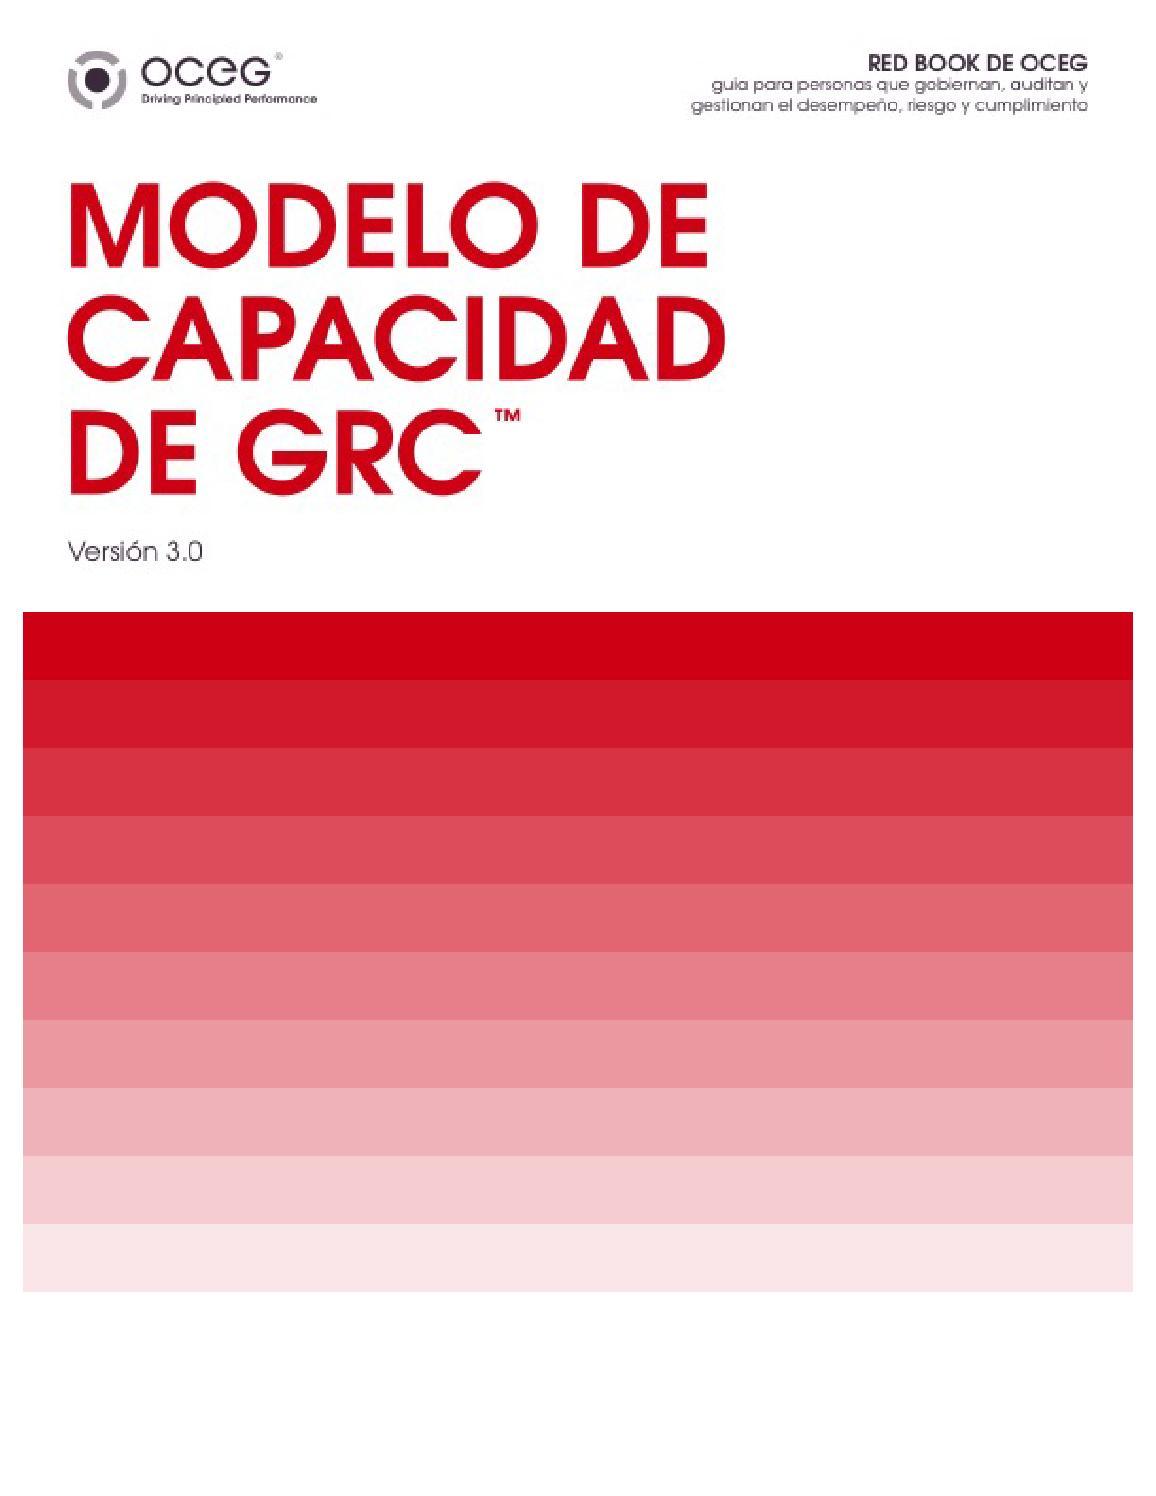 Red Book GRC Capability Model by Orlando Pineda Vallar - issuu